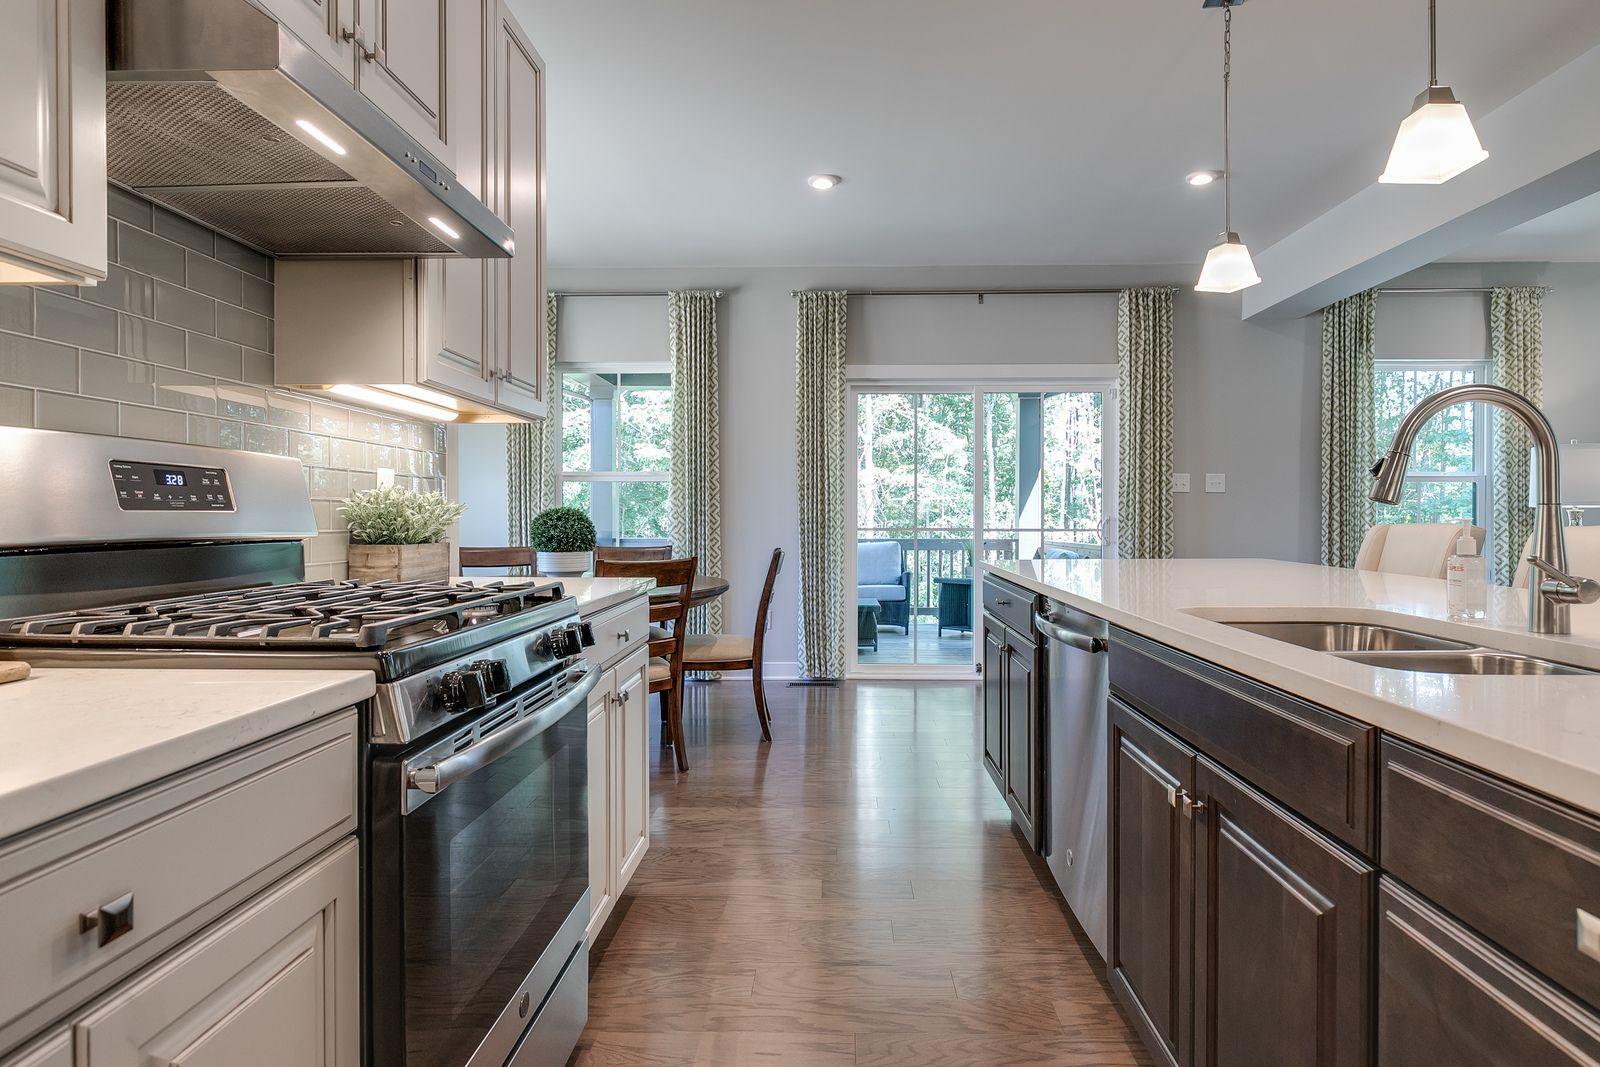 Kitchen featured in the Seneca at Hartland By Ryan Homes in Washington, VA